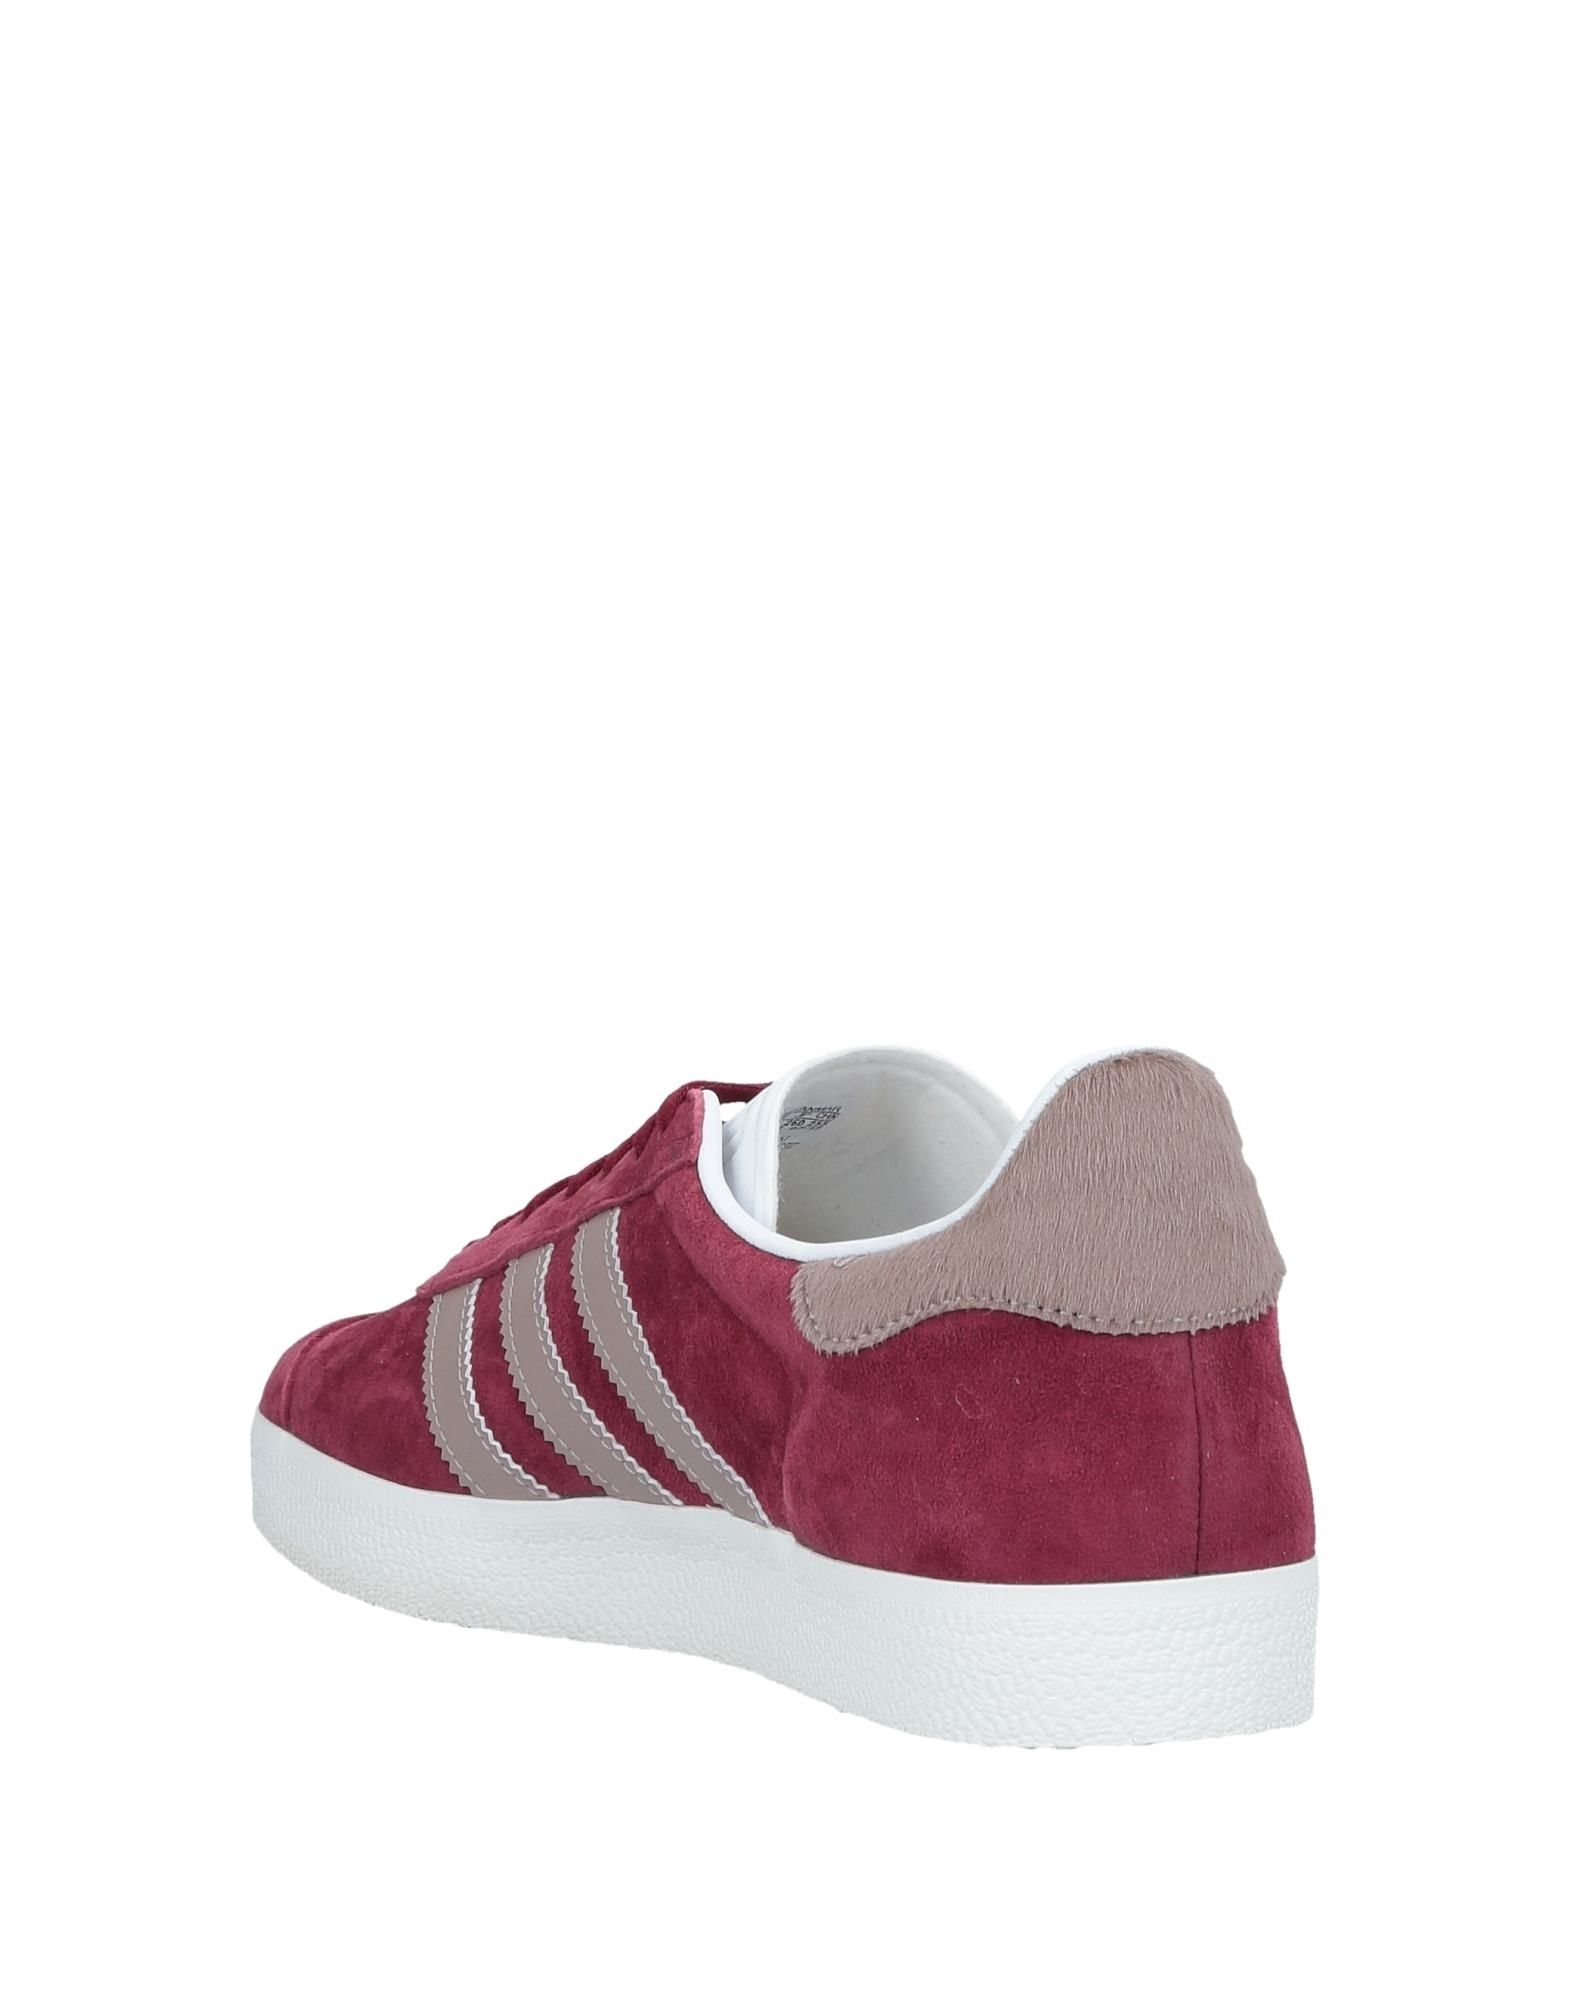 Adidas Originals Sneakers Damen  11530766OI Neue Schuhe